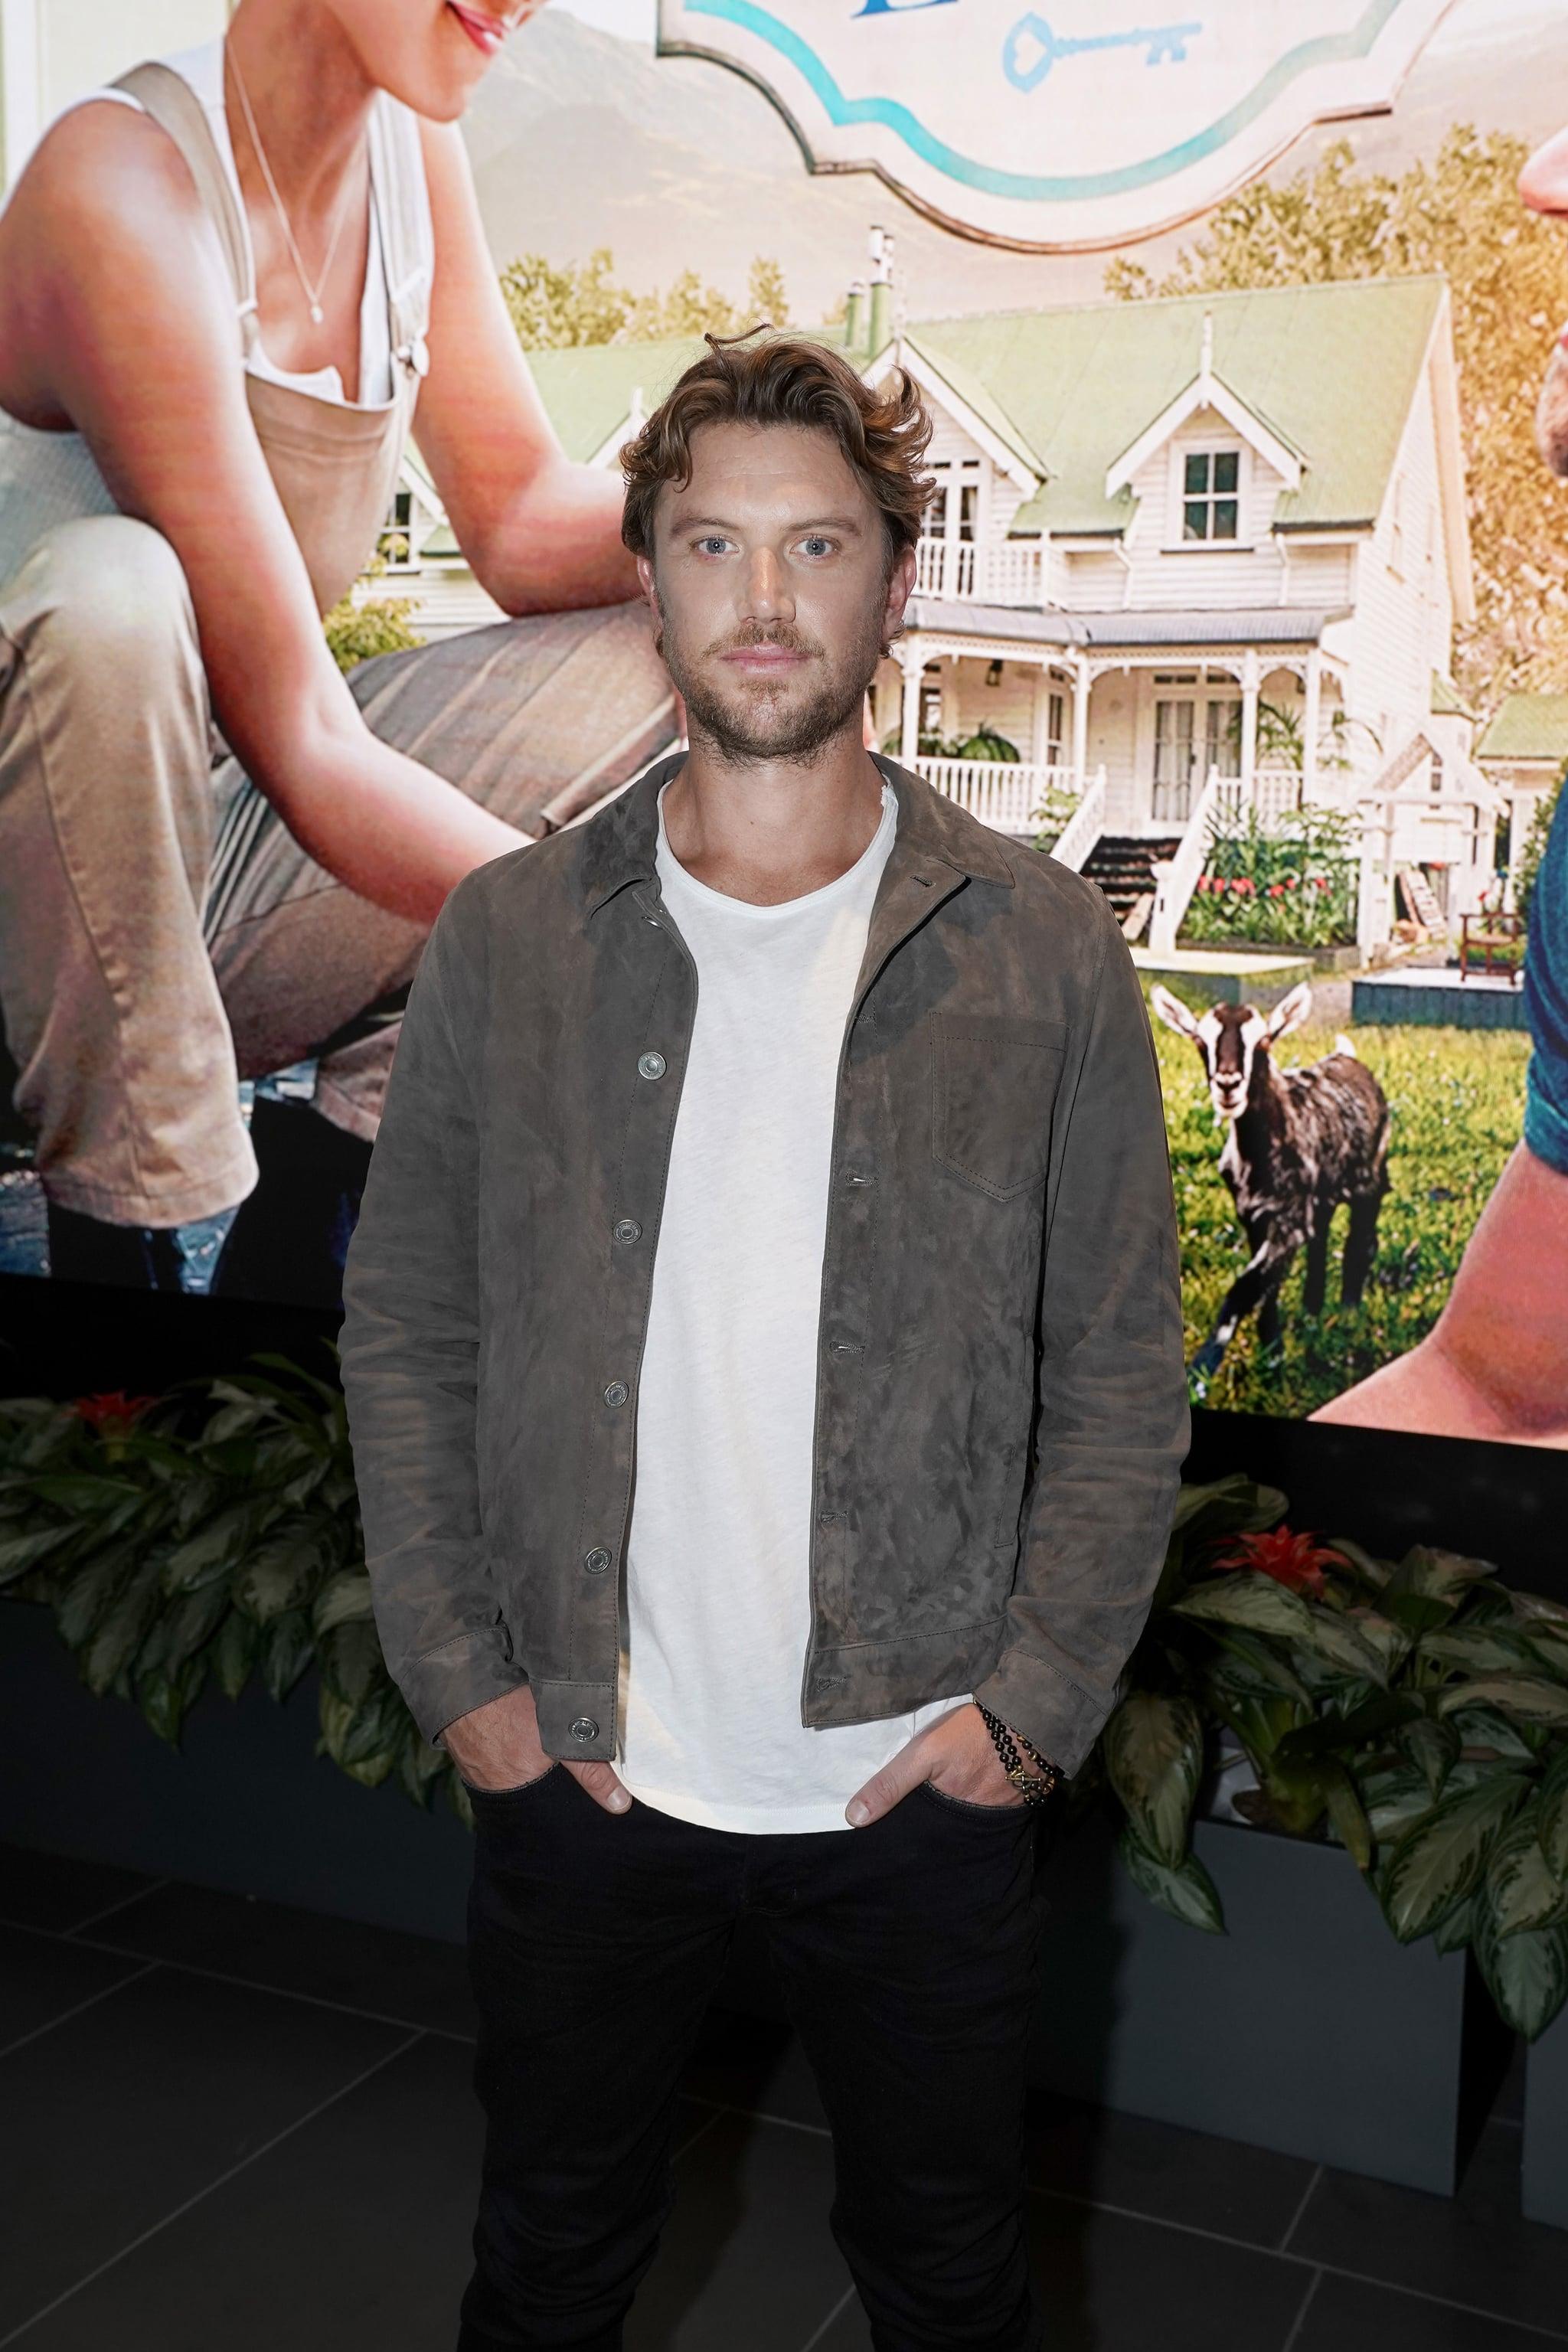 LOS ANGELES, CALIFORNIA - AUGUST 28: Adam Demos attends Netflix's